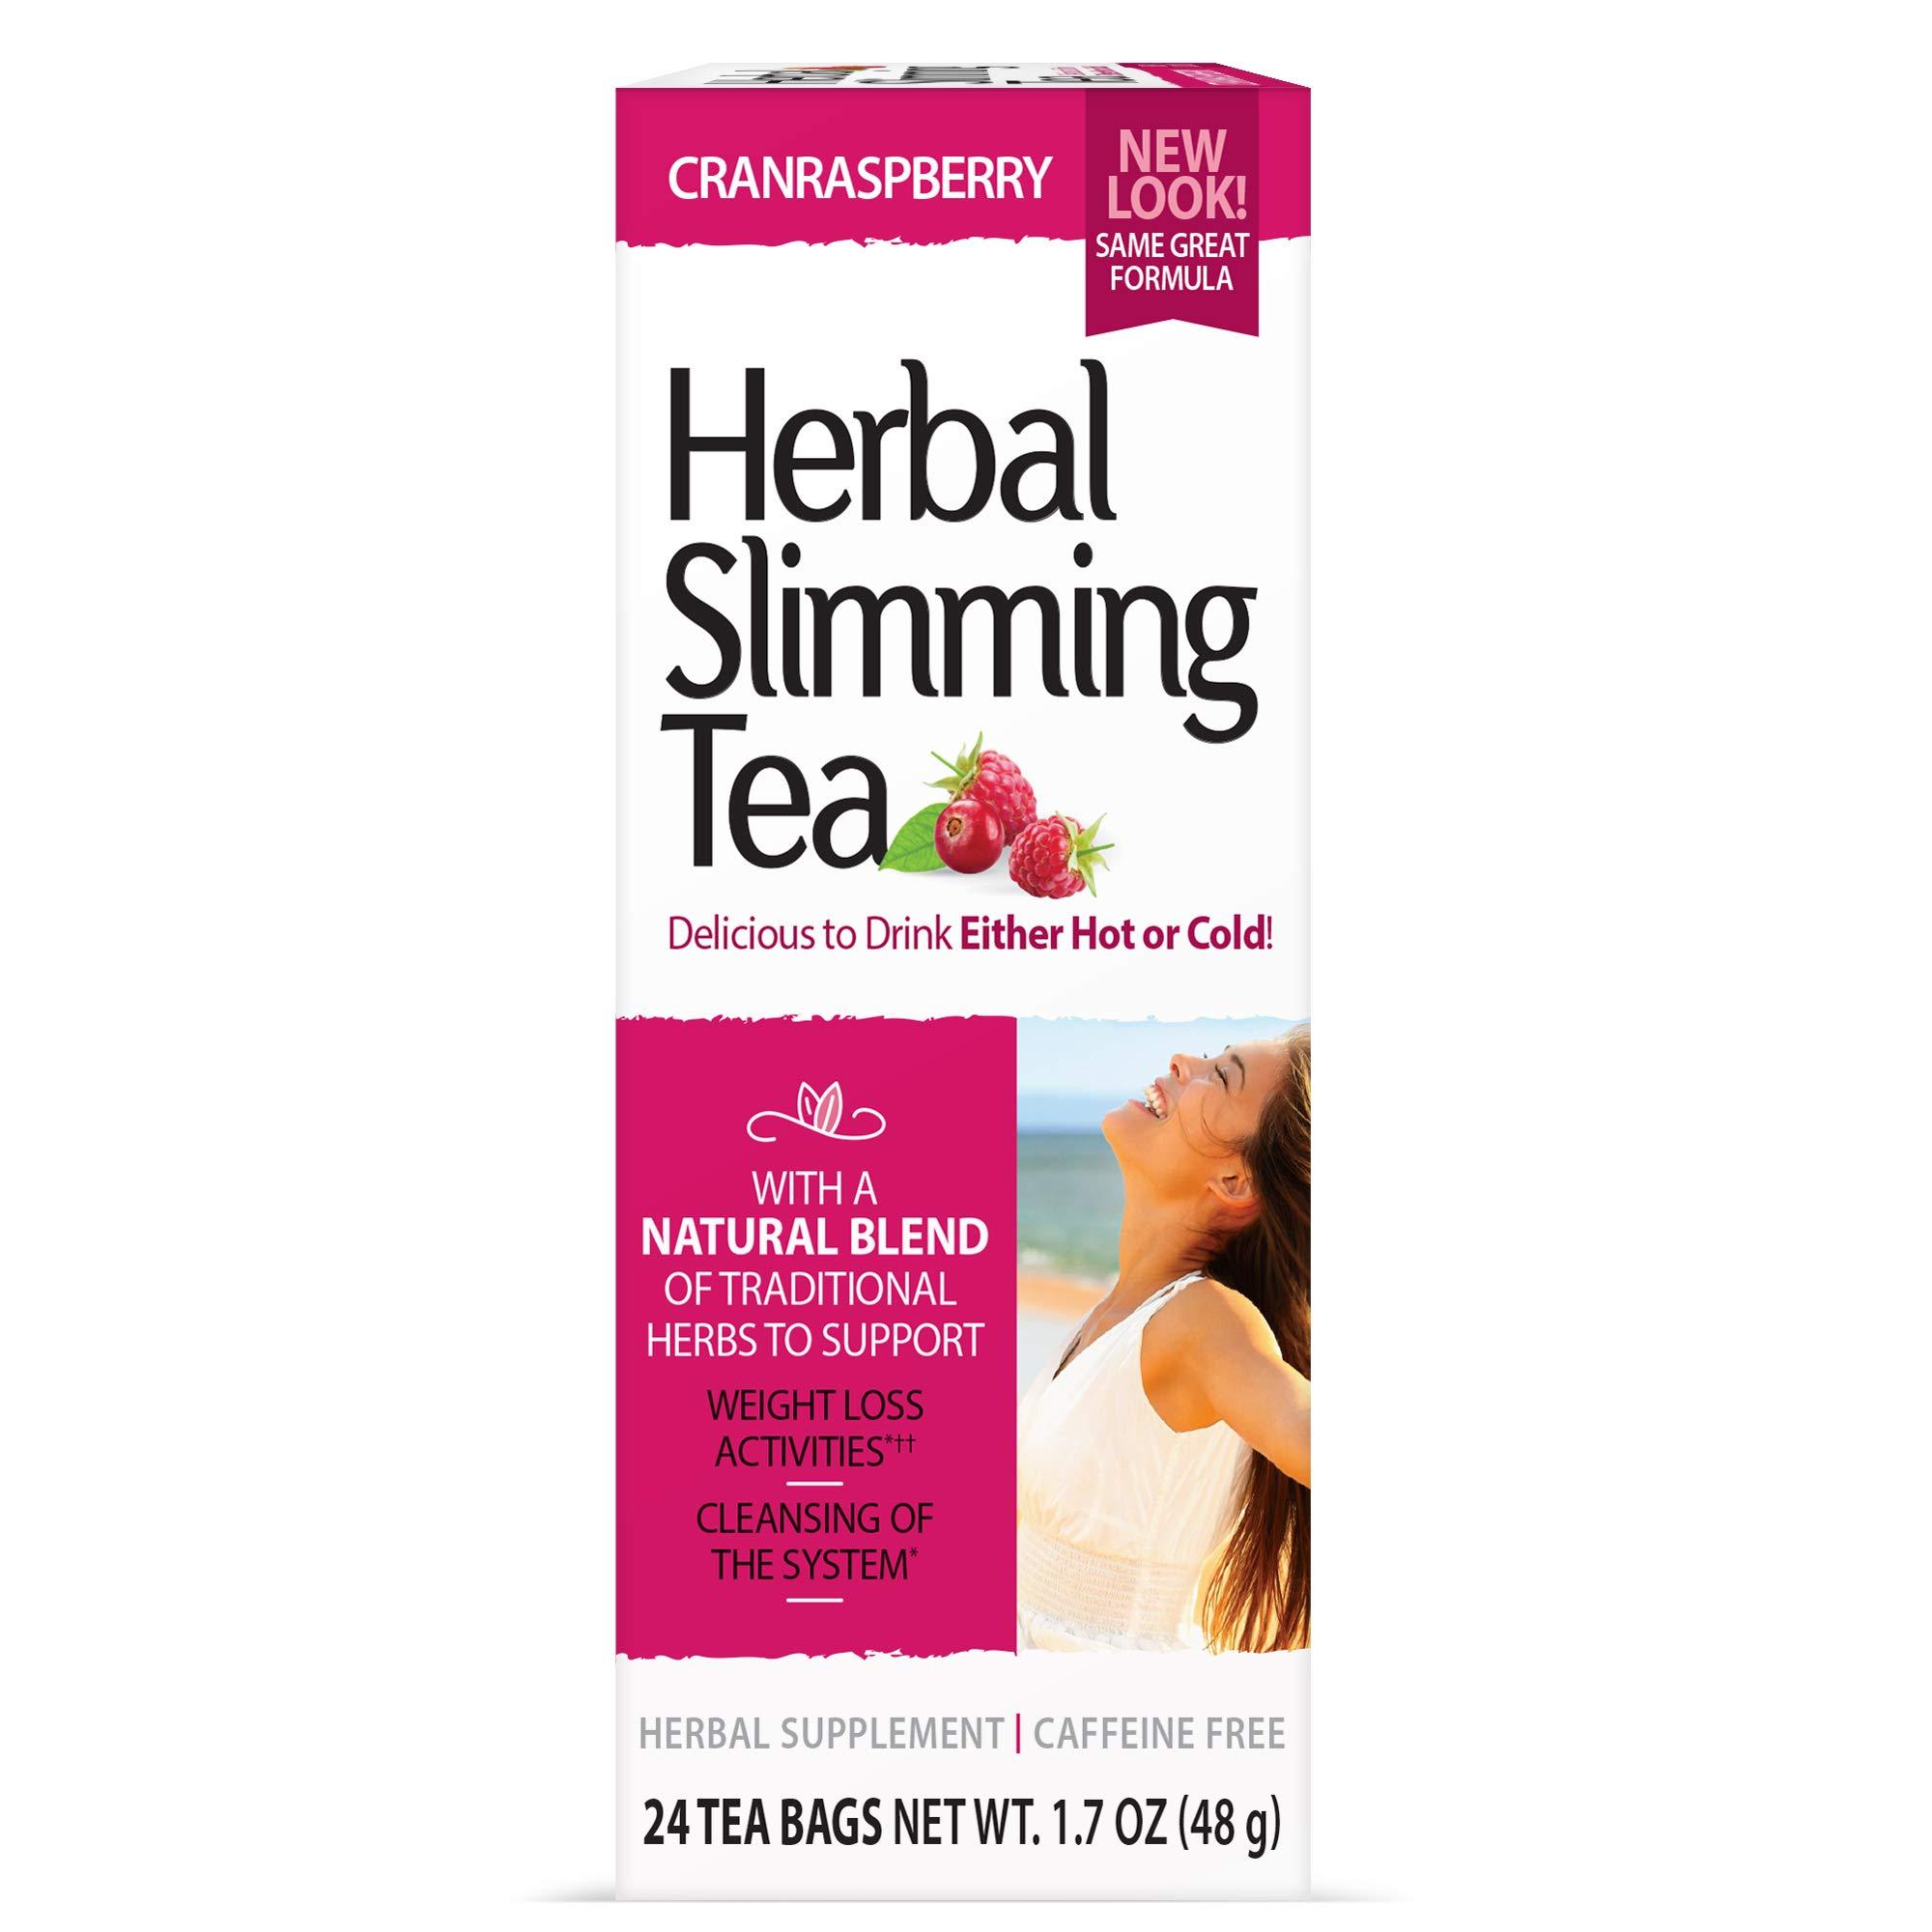 21st Century Slimming Tea, Cran Raspberry 24 Count